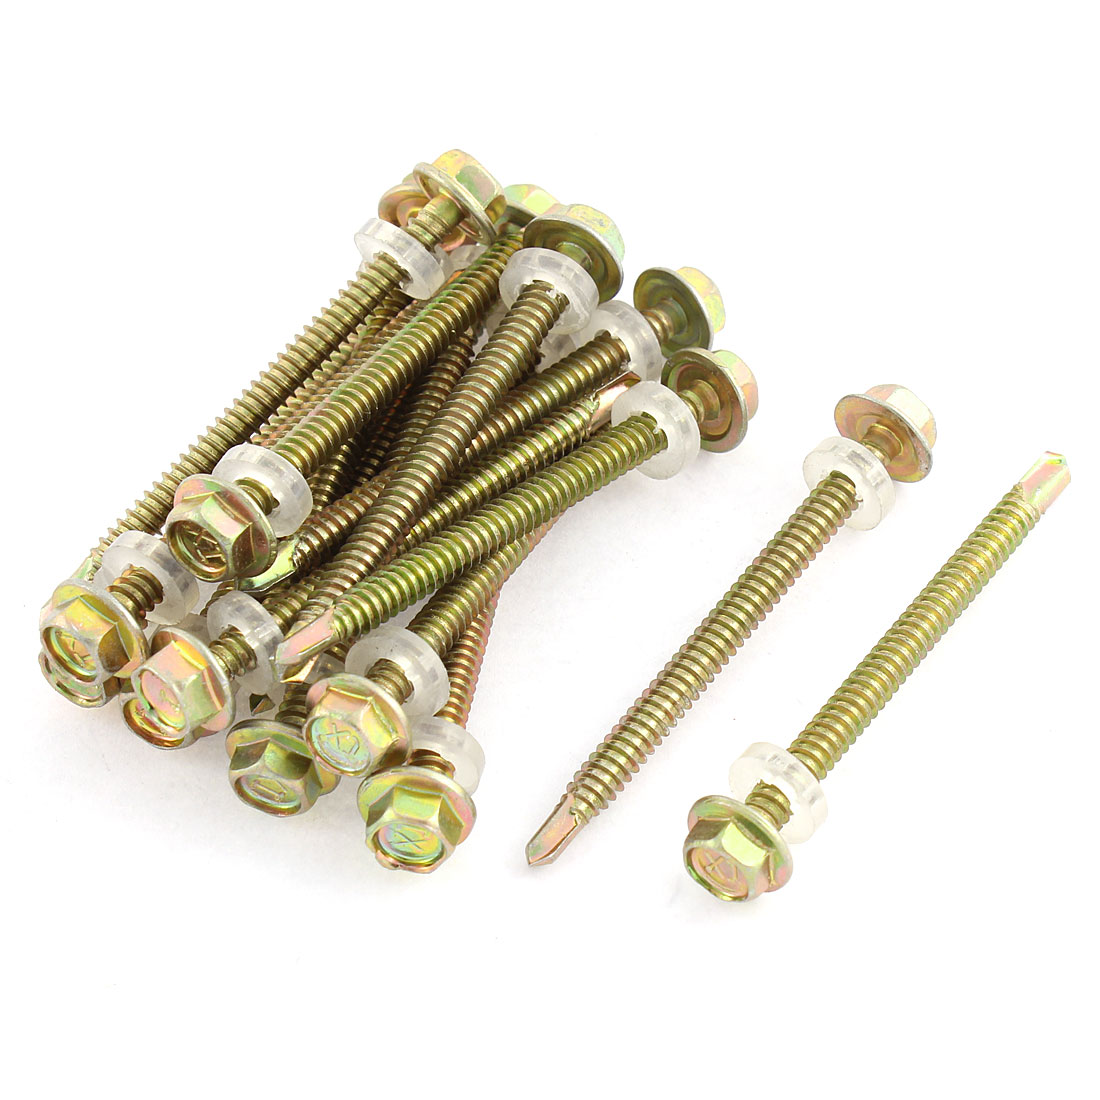 "17pcs 5/16"" Hex Head 4.5mm Thread 2.5"" Long Self Drilling Tapping Screw"